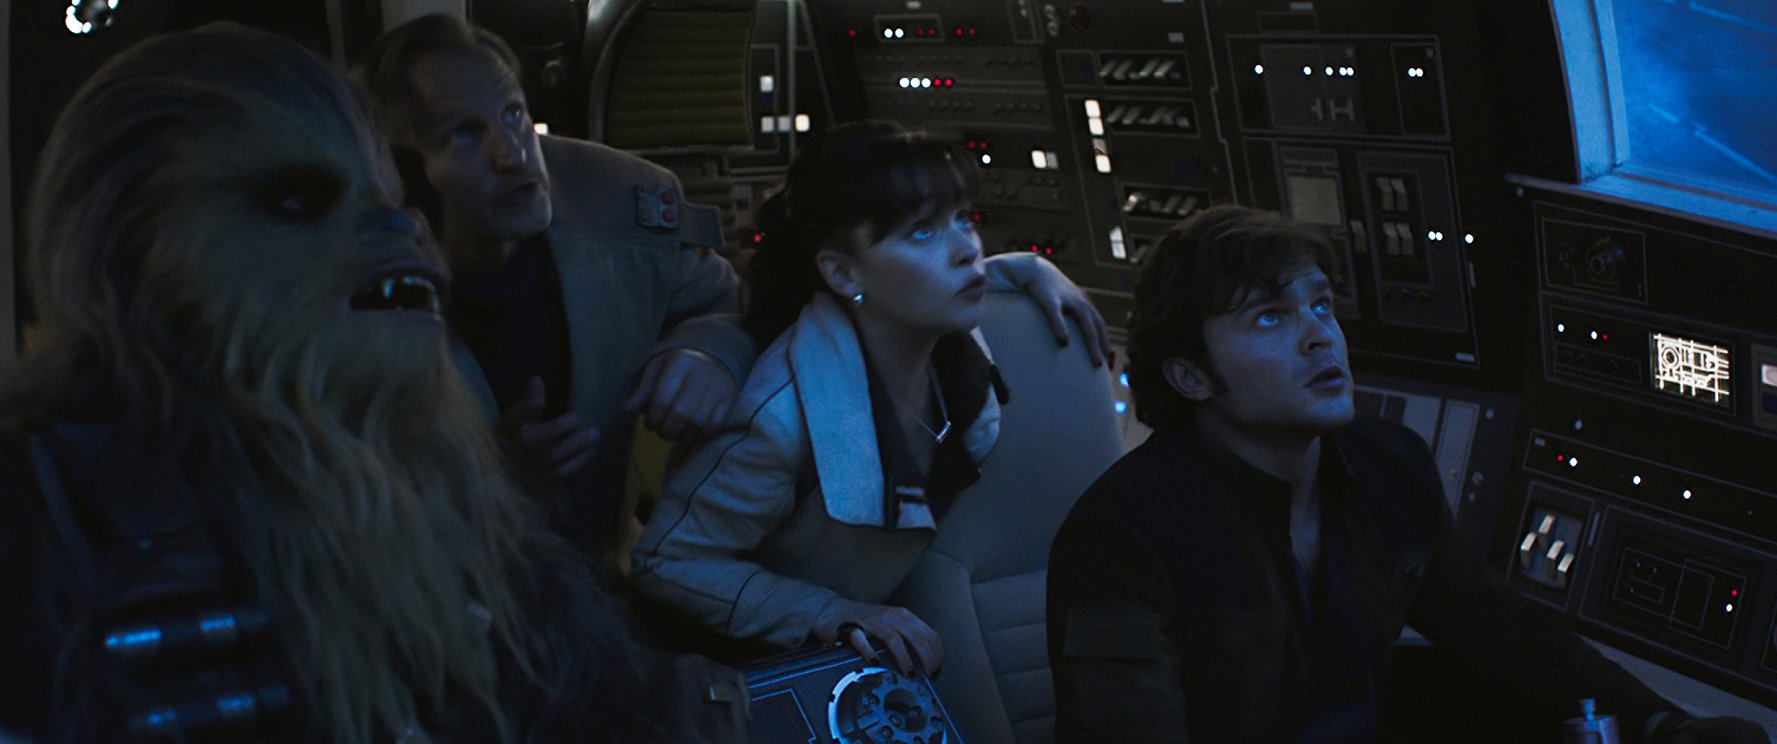 https://cinemaplanet.pt/wp-content/uploads/2018/02/solo-star-wars.jpg